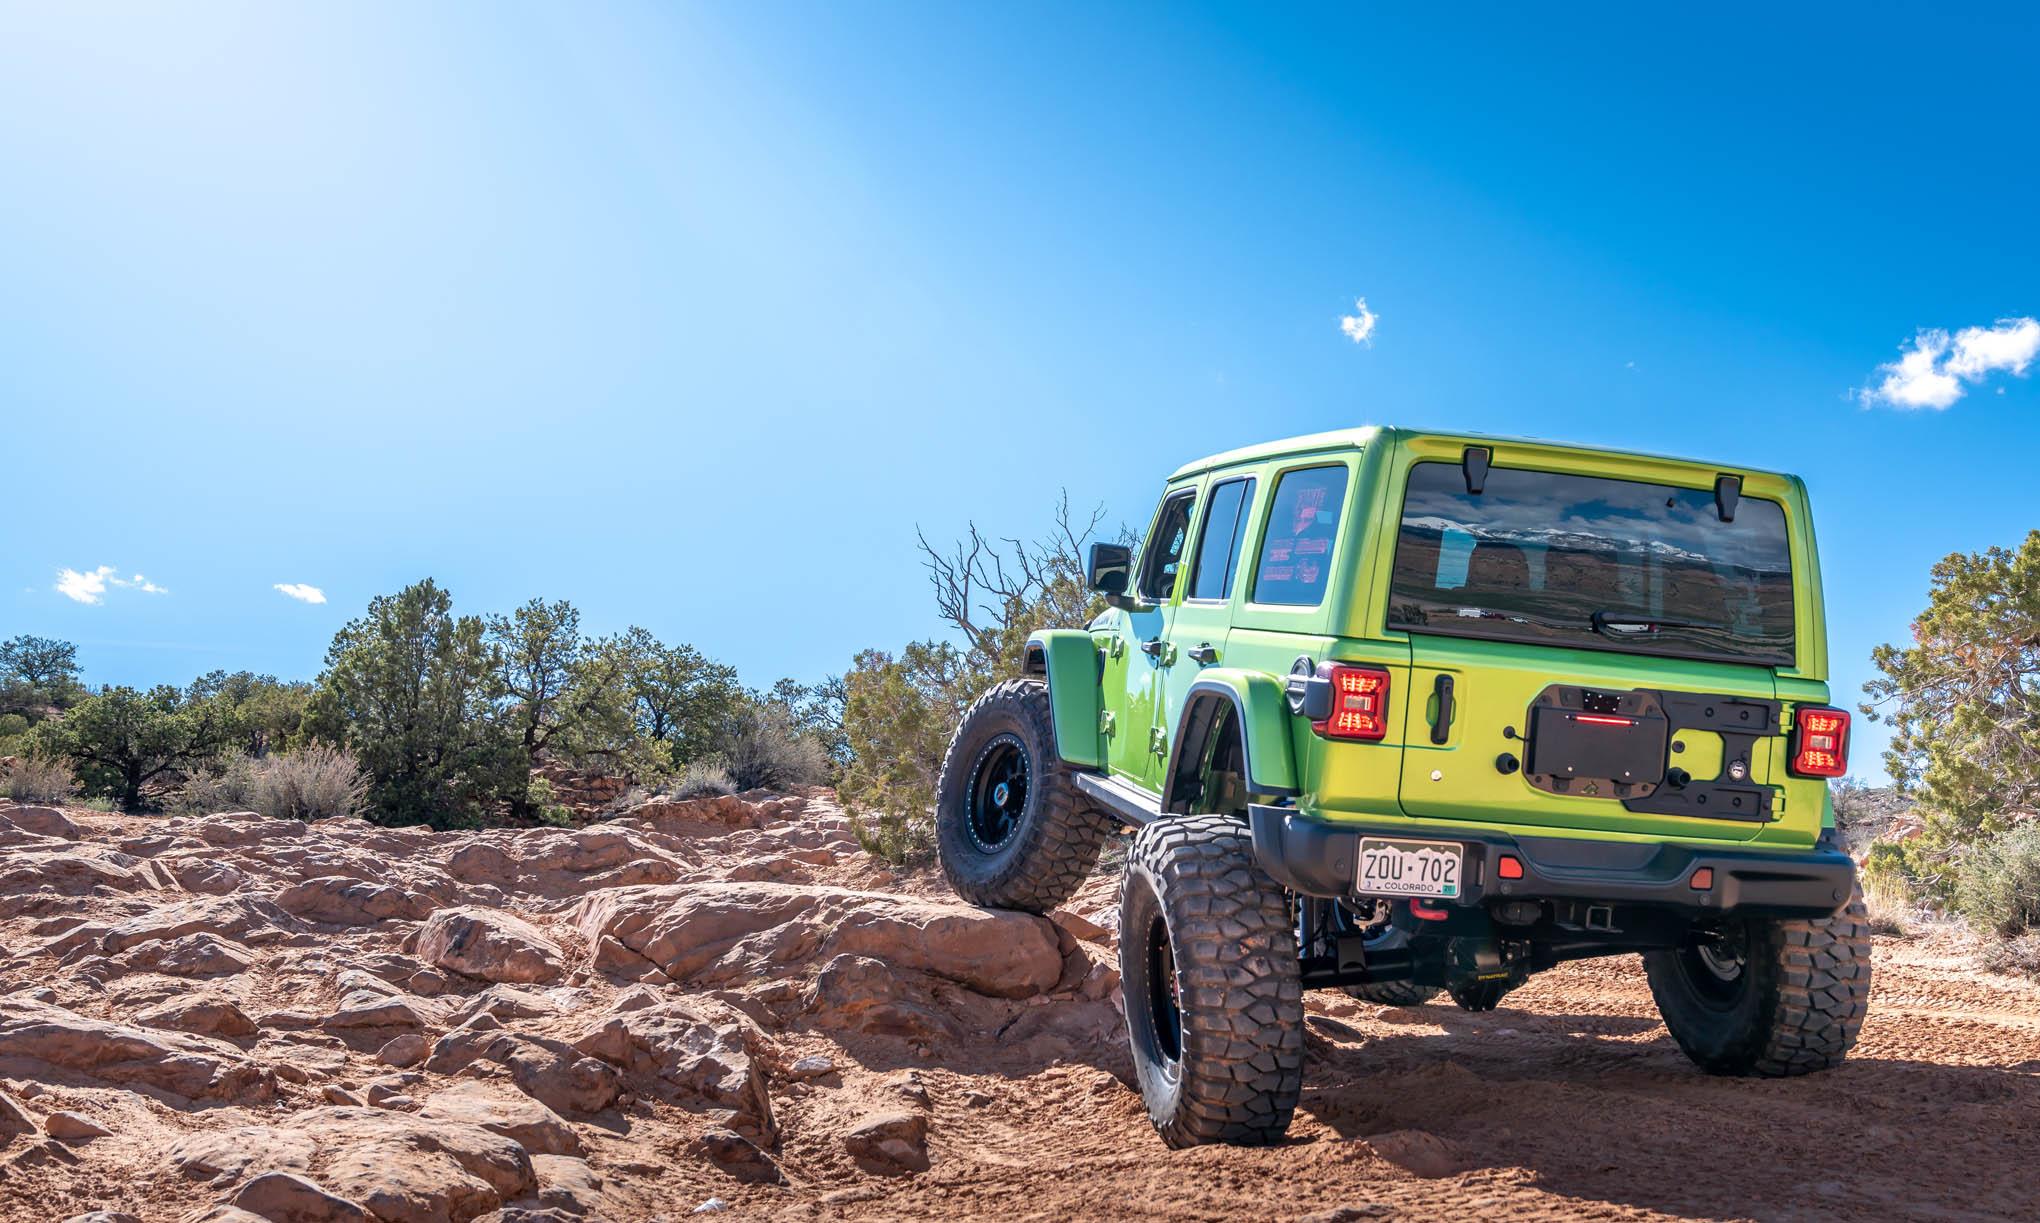 0025 2018 jeep wrangler unlimited rubicon dynatrac prorock 42 dixie 4 wheel drive